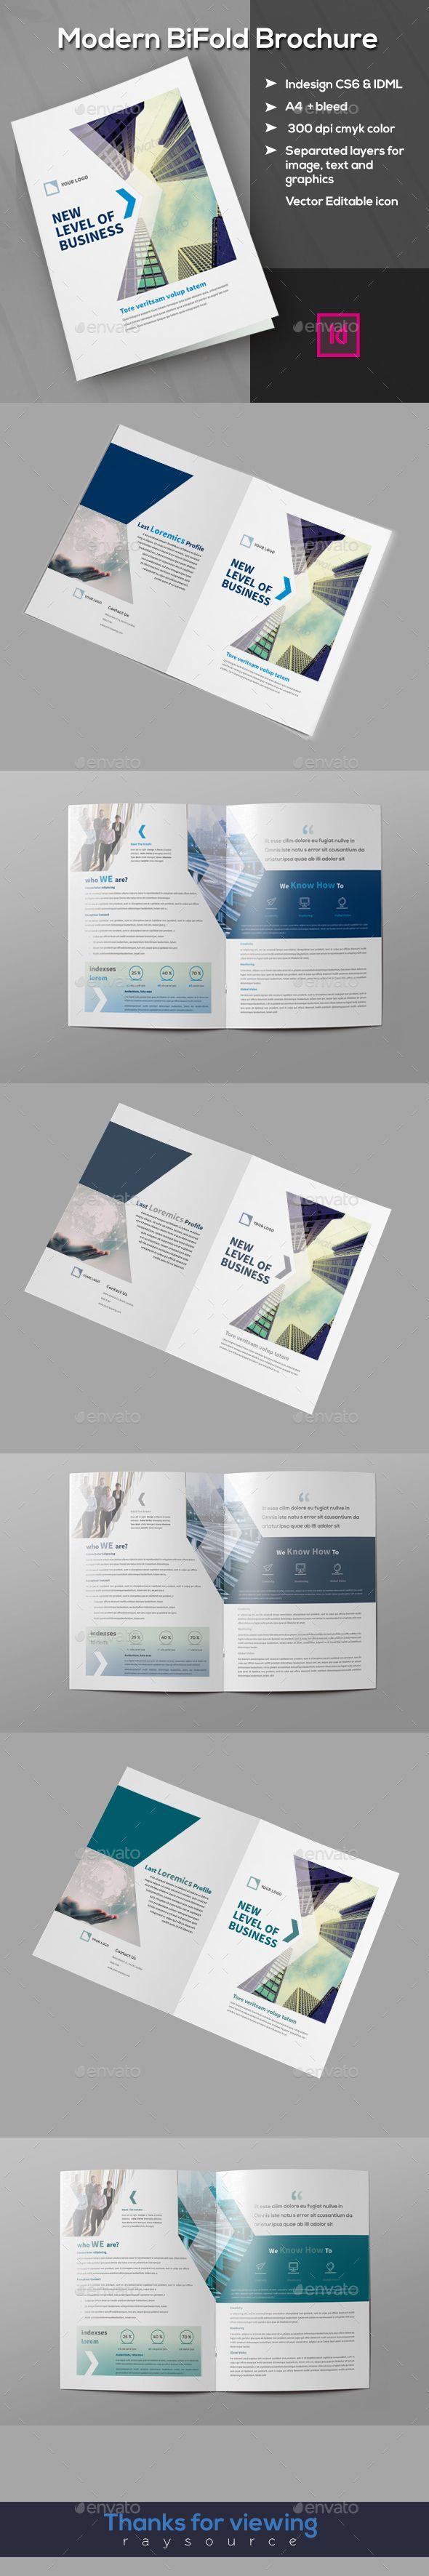 Modern Bifold Brochure Template InDesign INDD. Download here: https://graphicriver.net/item/modern-bifold-brochure/17417893?ref=ksioks